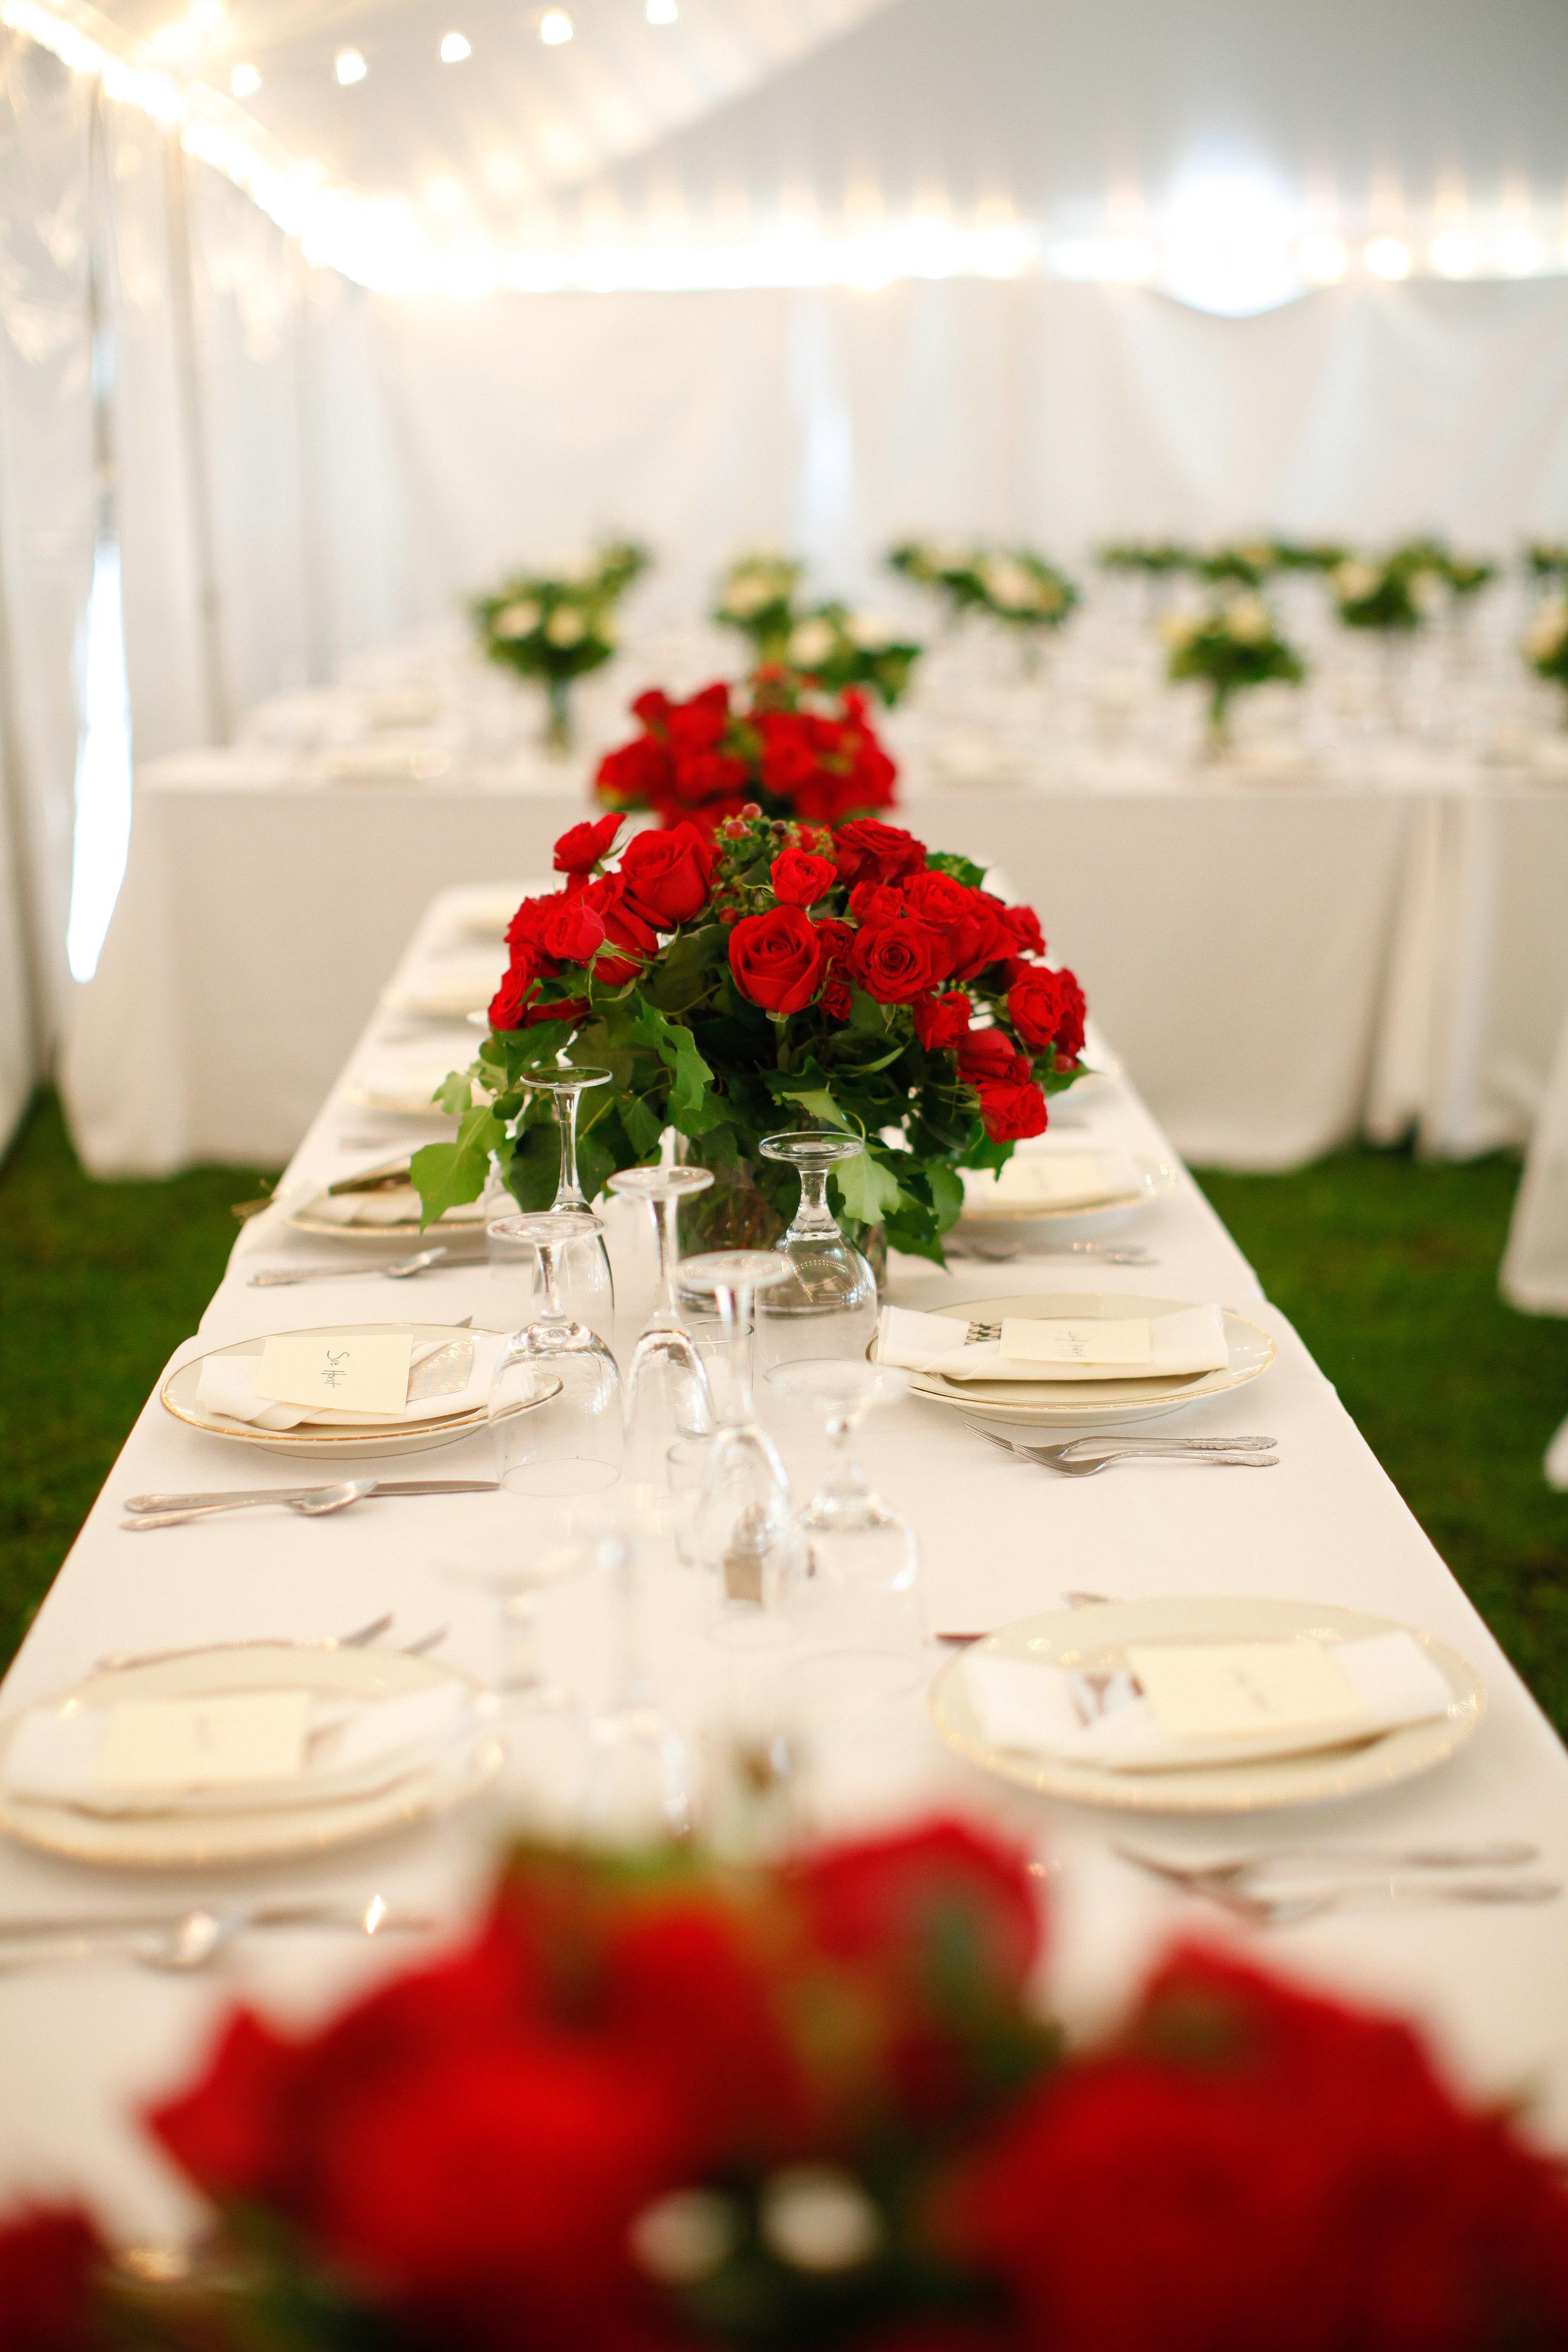 Wedding rentals in Lebanon PA